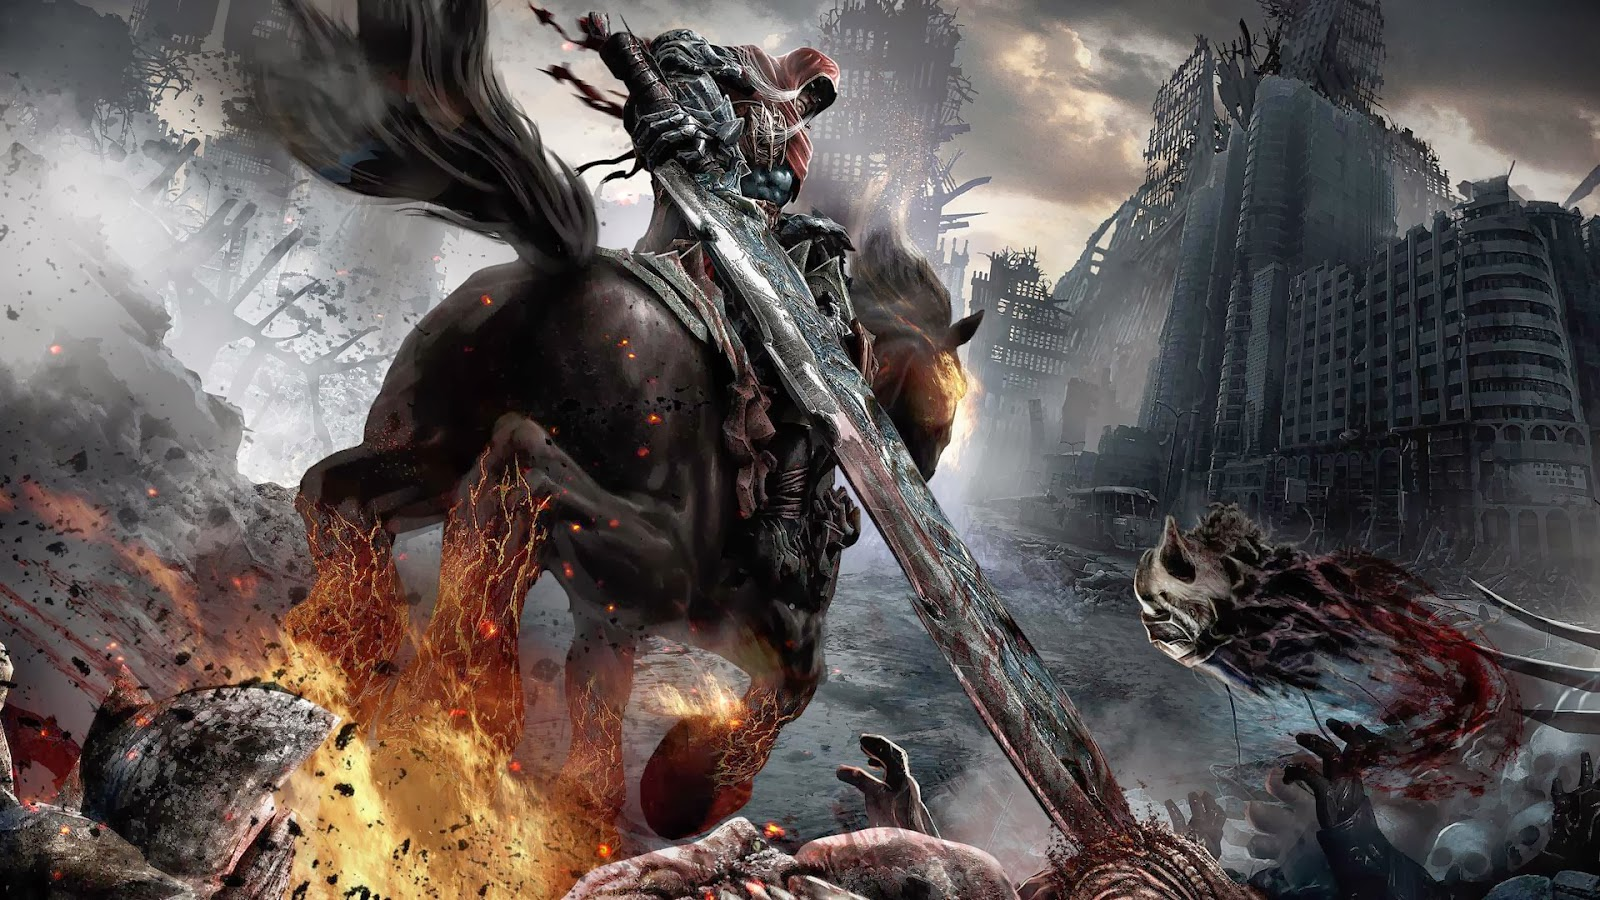 ashley wallpaper: games wallpapers hd 1080p download